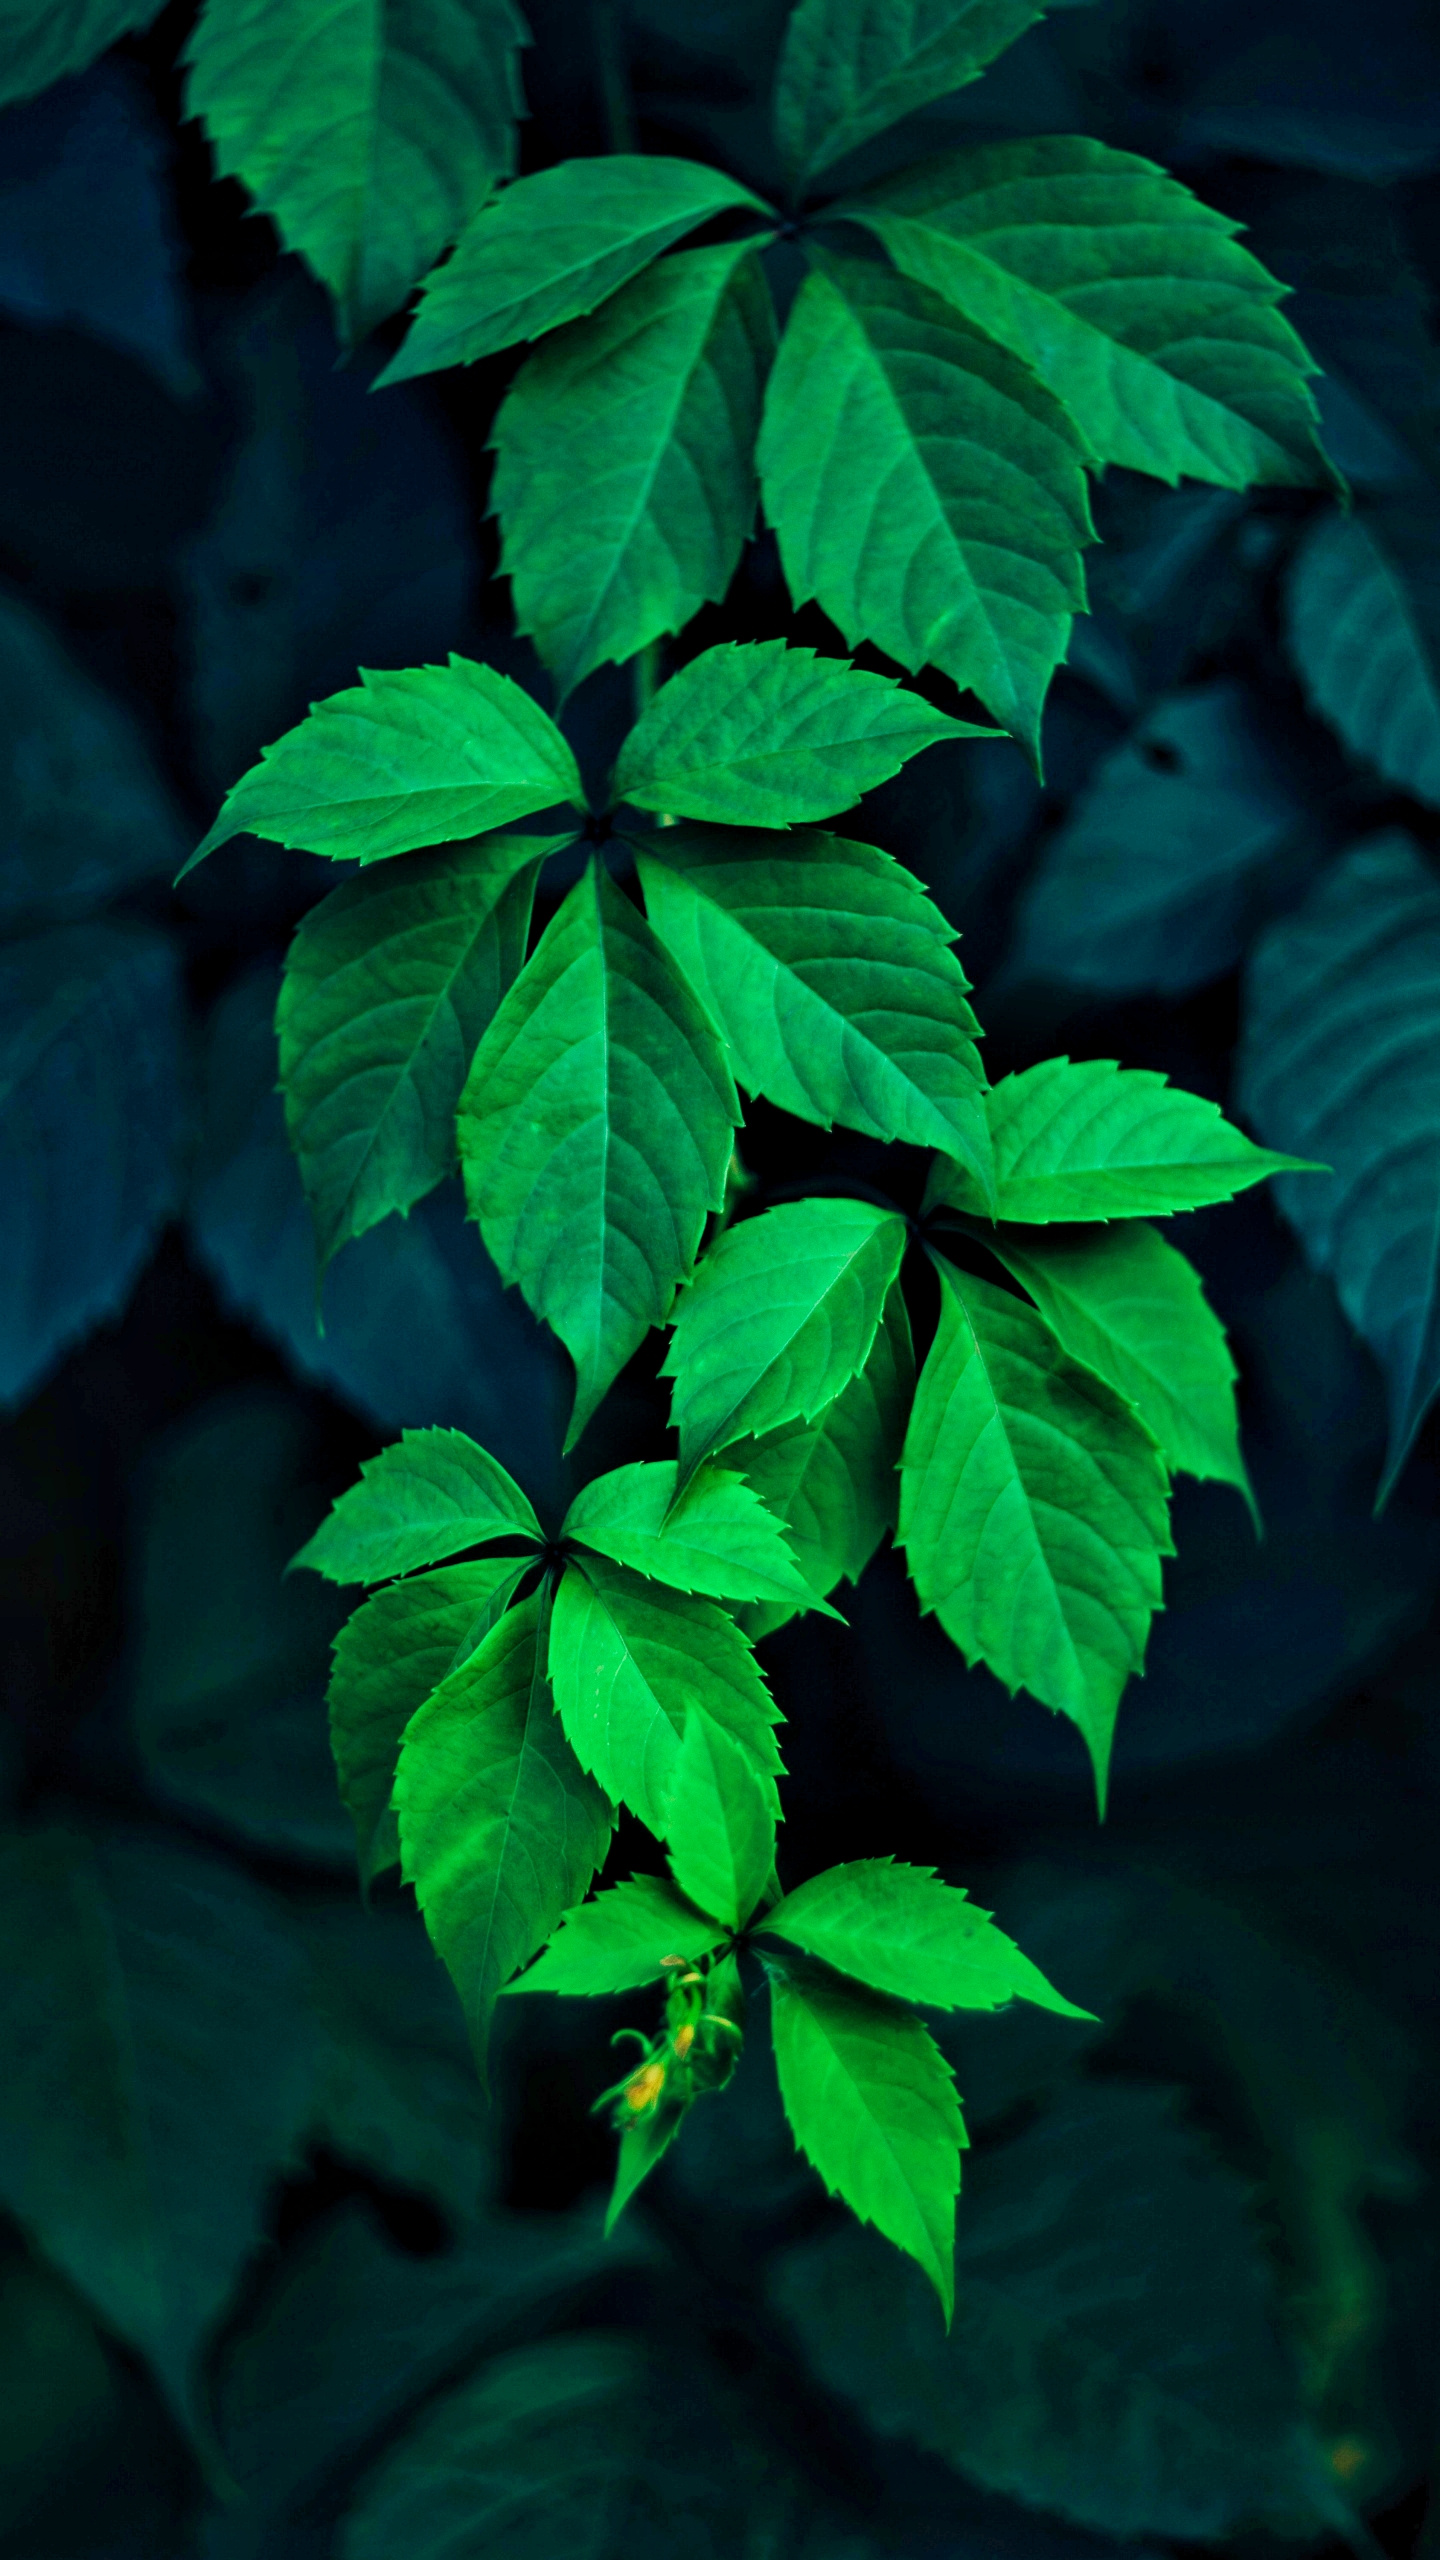 green_leaves.jpg